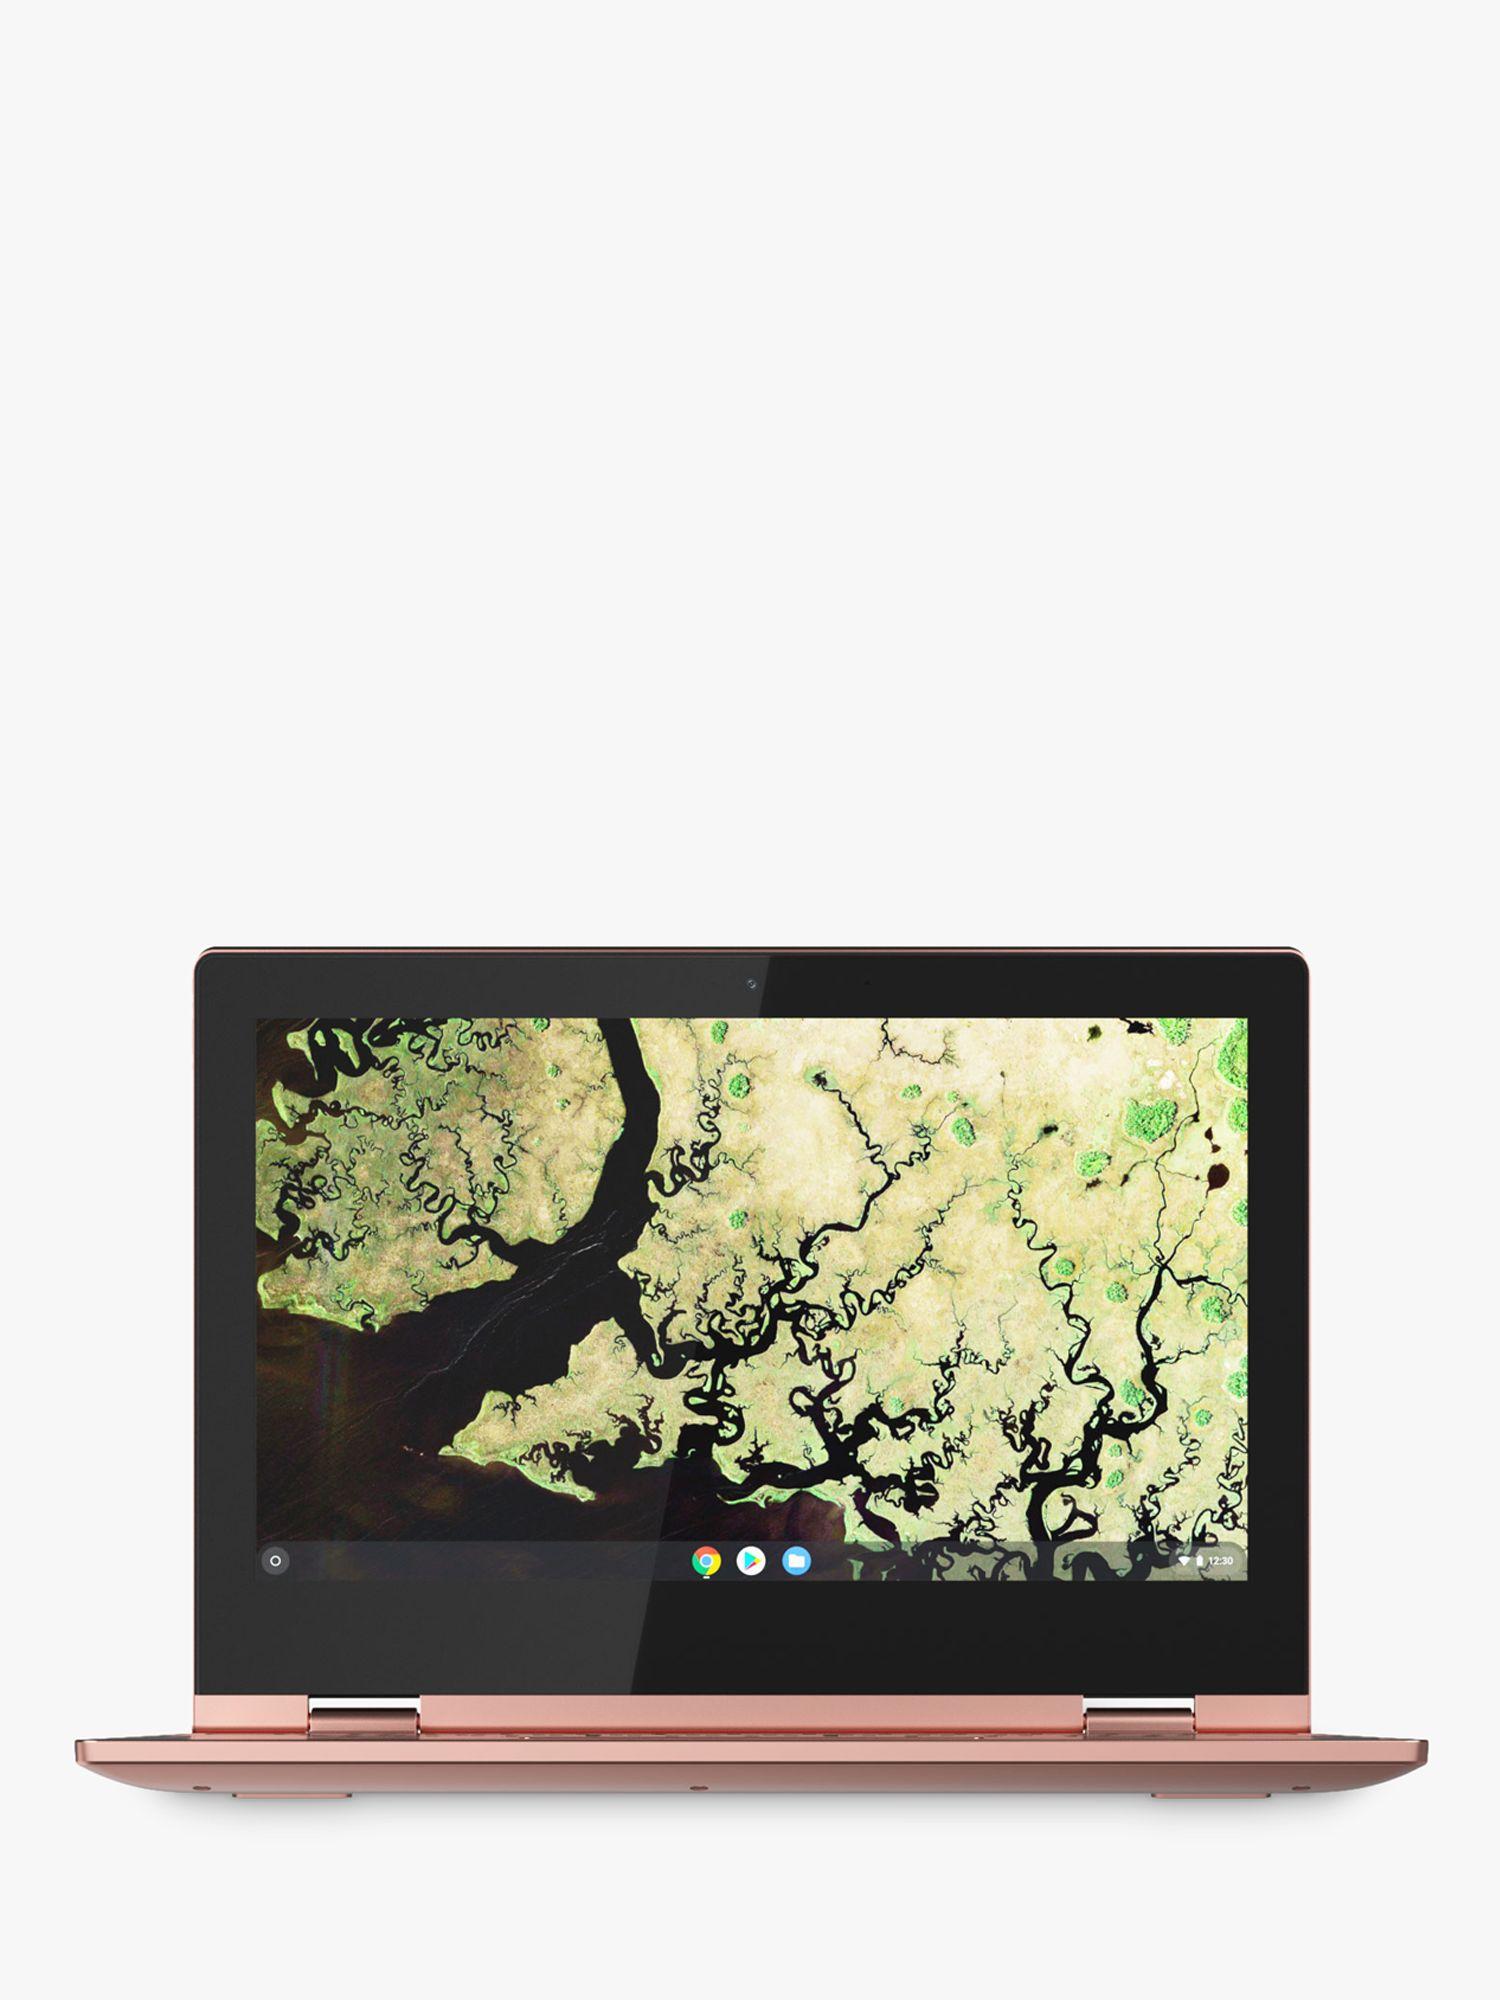 Lenovo Lenovo C340-11 Chromebook, Intel Celeron, 4G RAM, 32GB eMMC, 11.6, Sand Pink